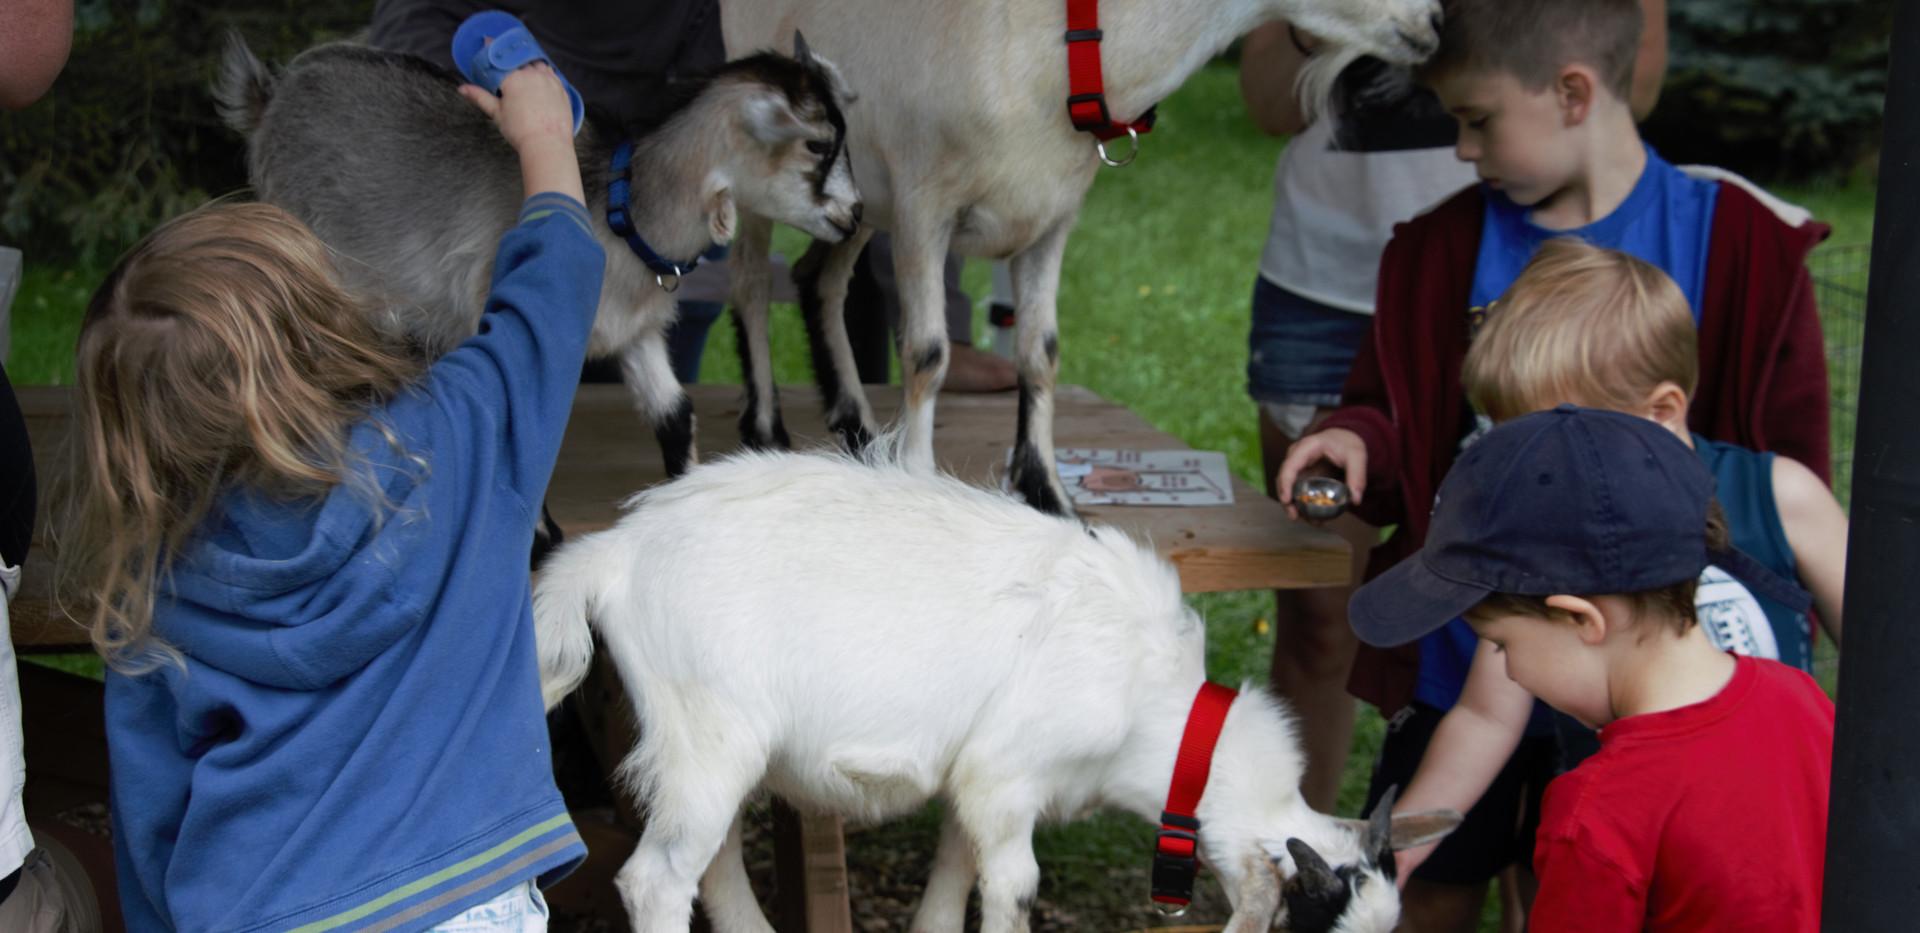 Feeding and brushing the goats.jpg